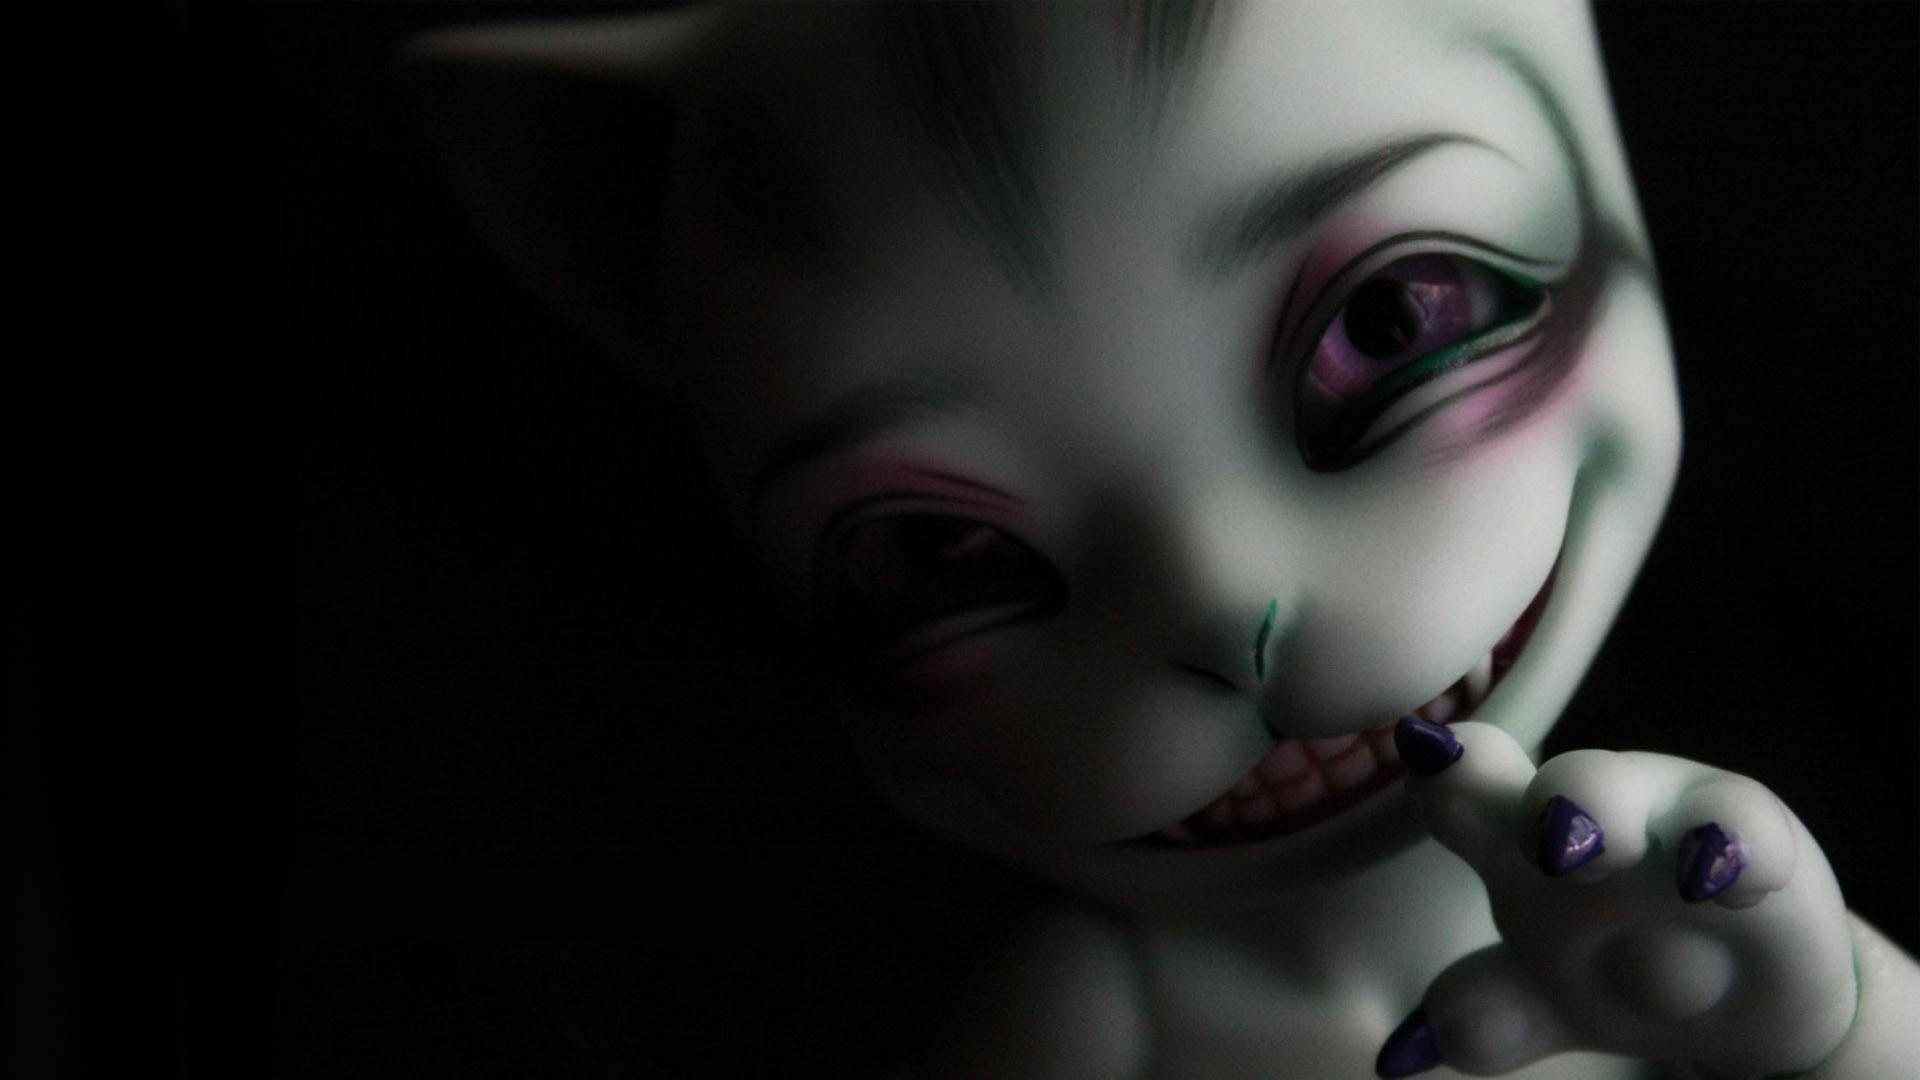 Evil Scary Desktop hd Screensaver. Dark Creepy Background